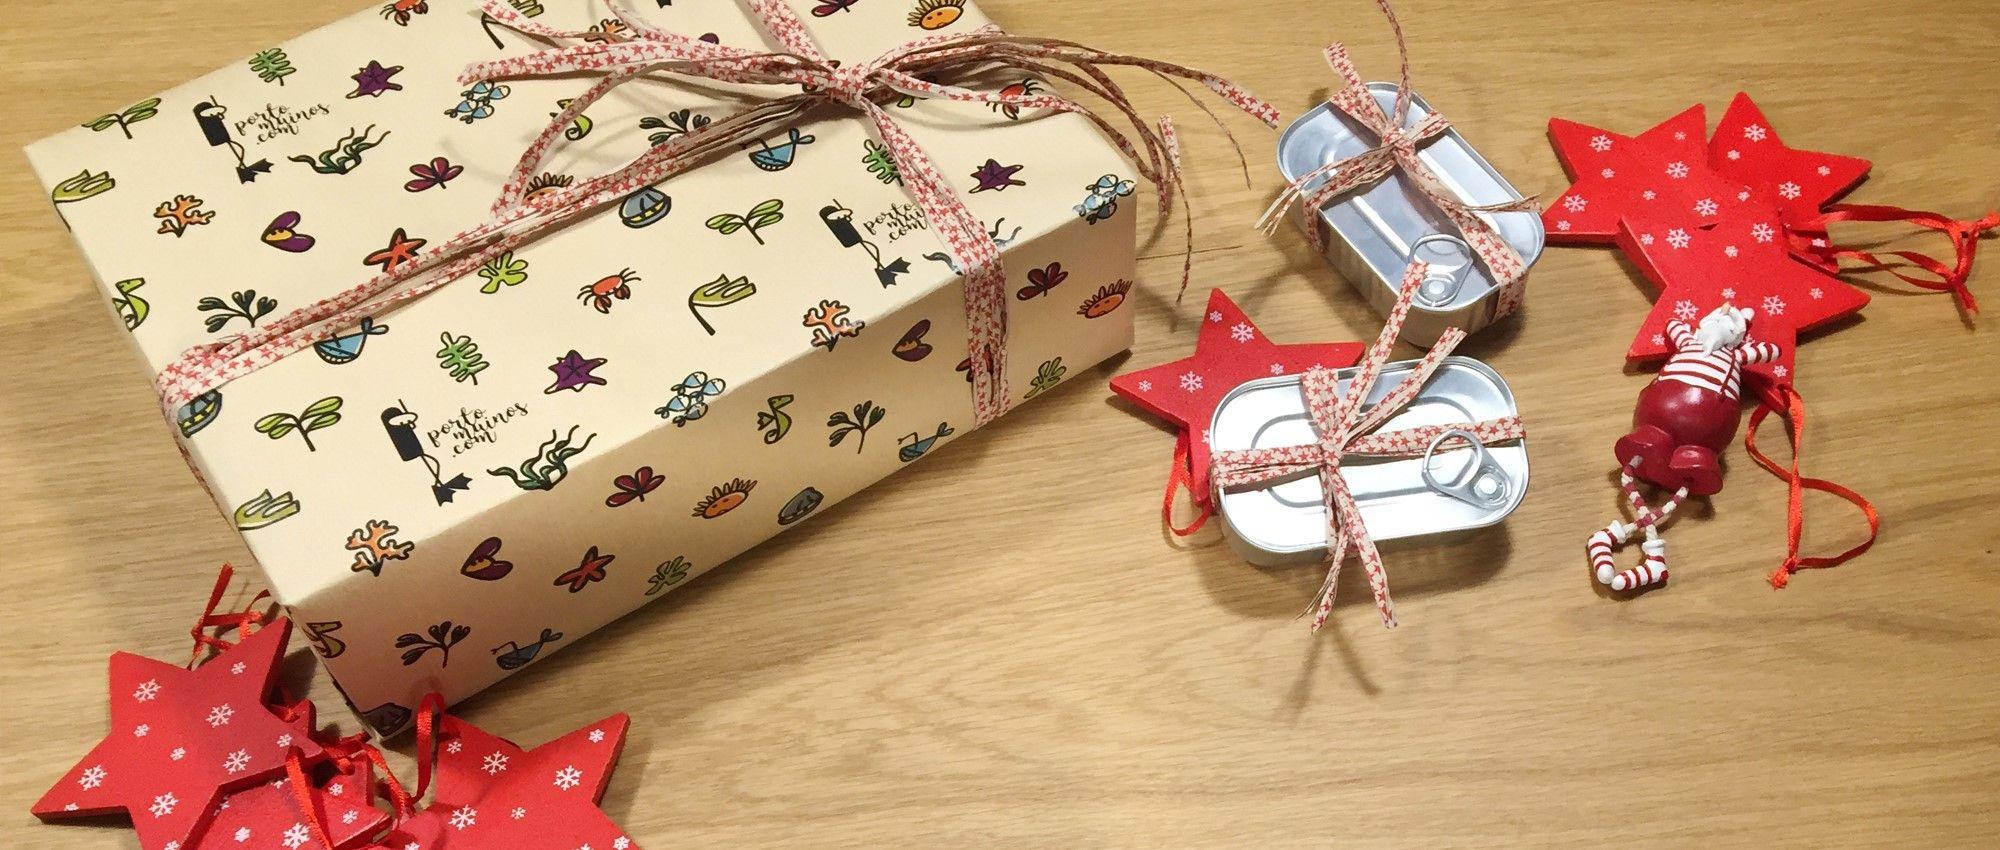 Special Christmas packs